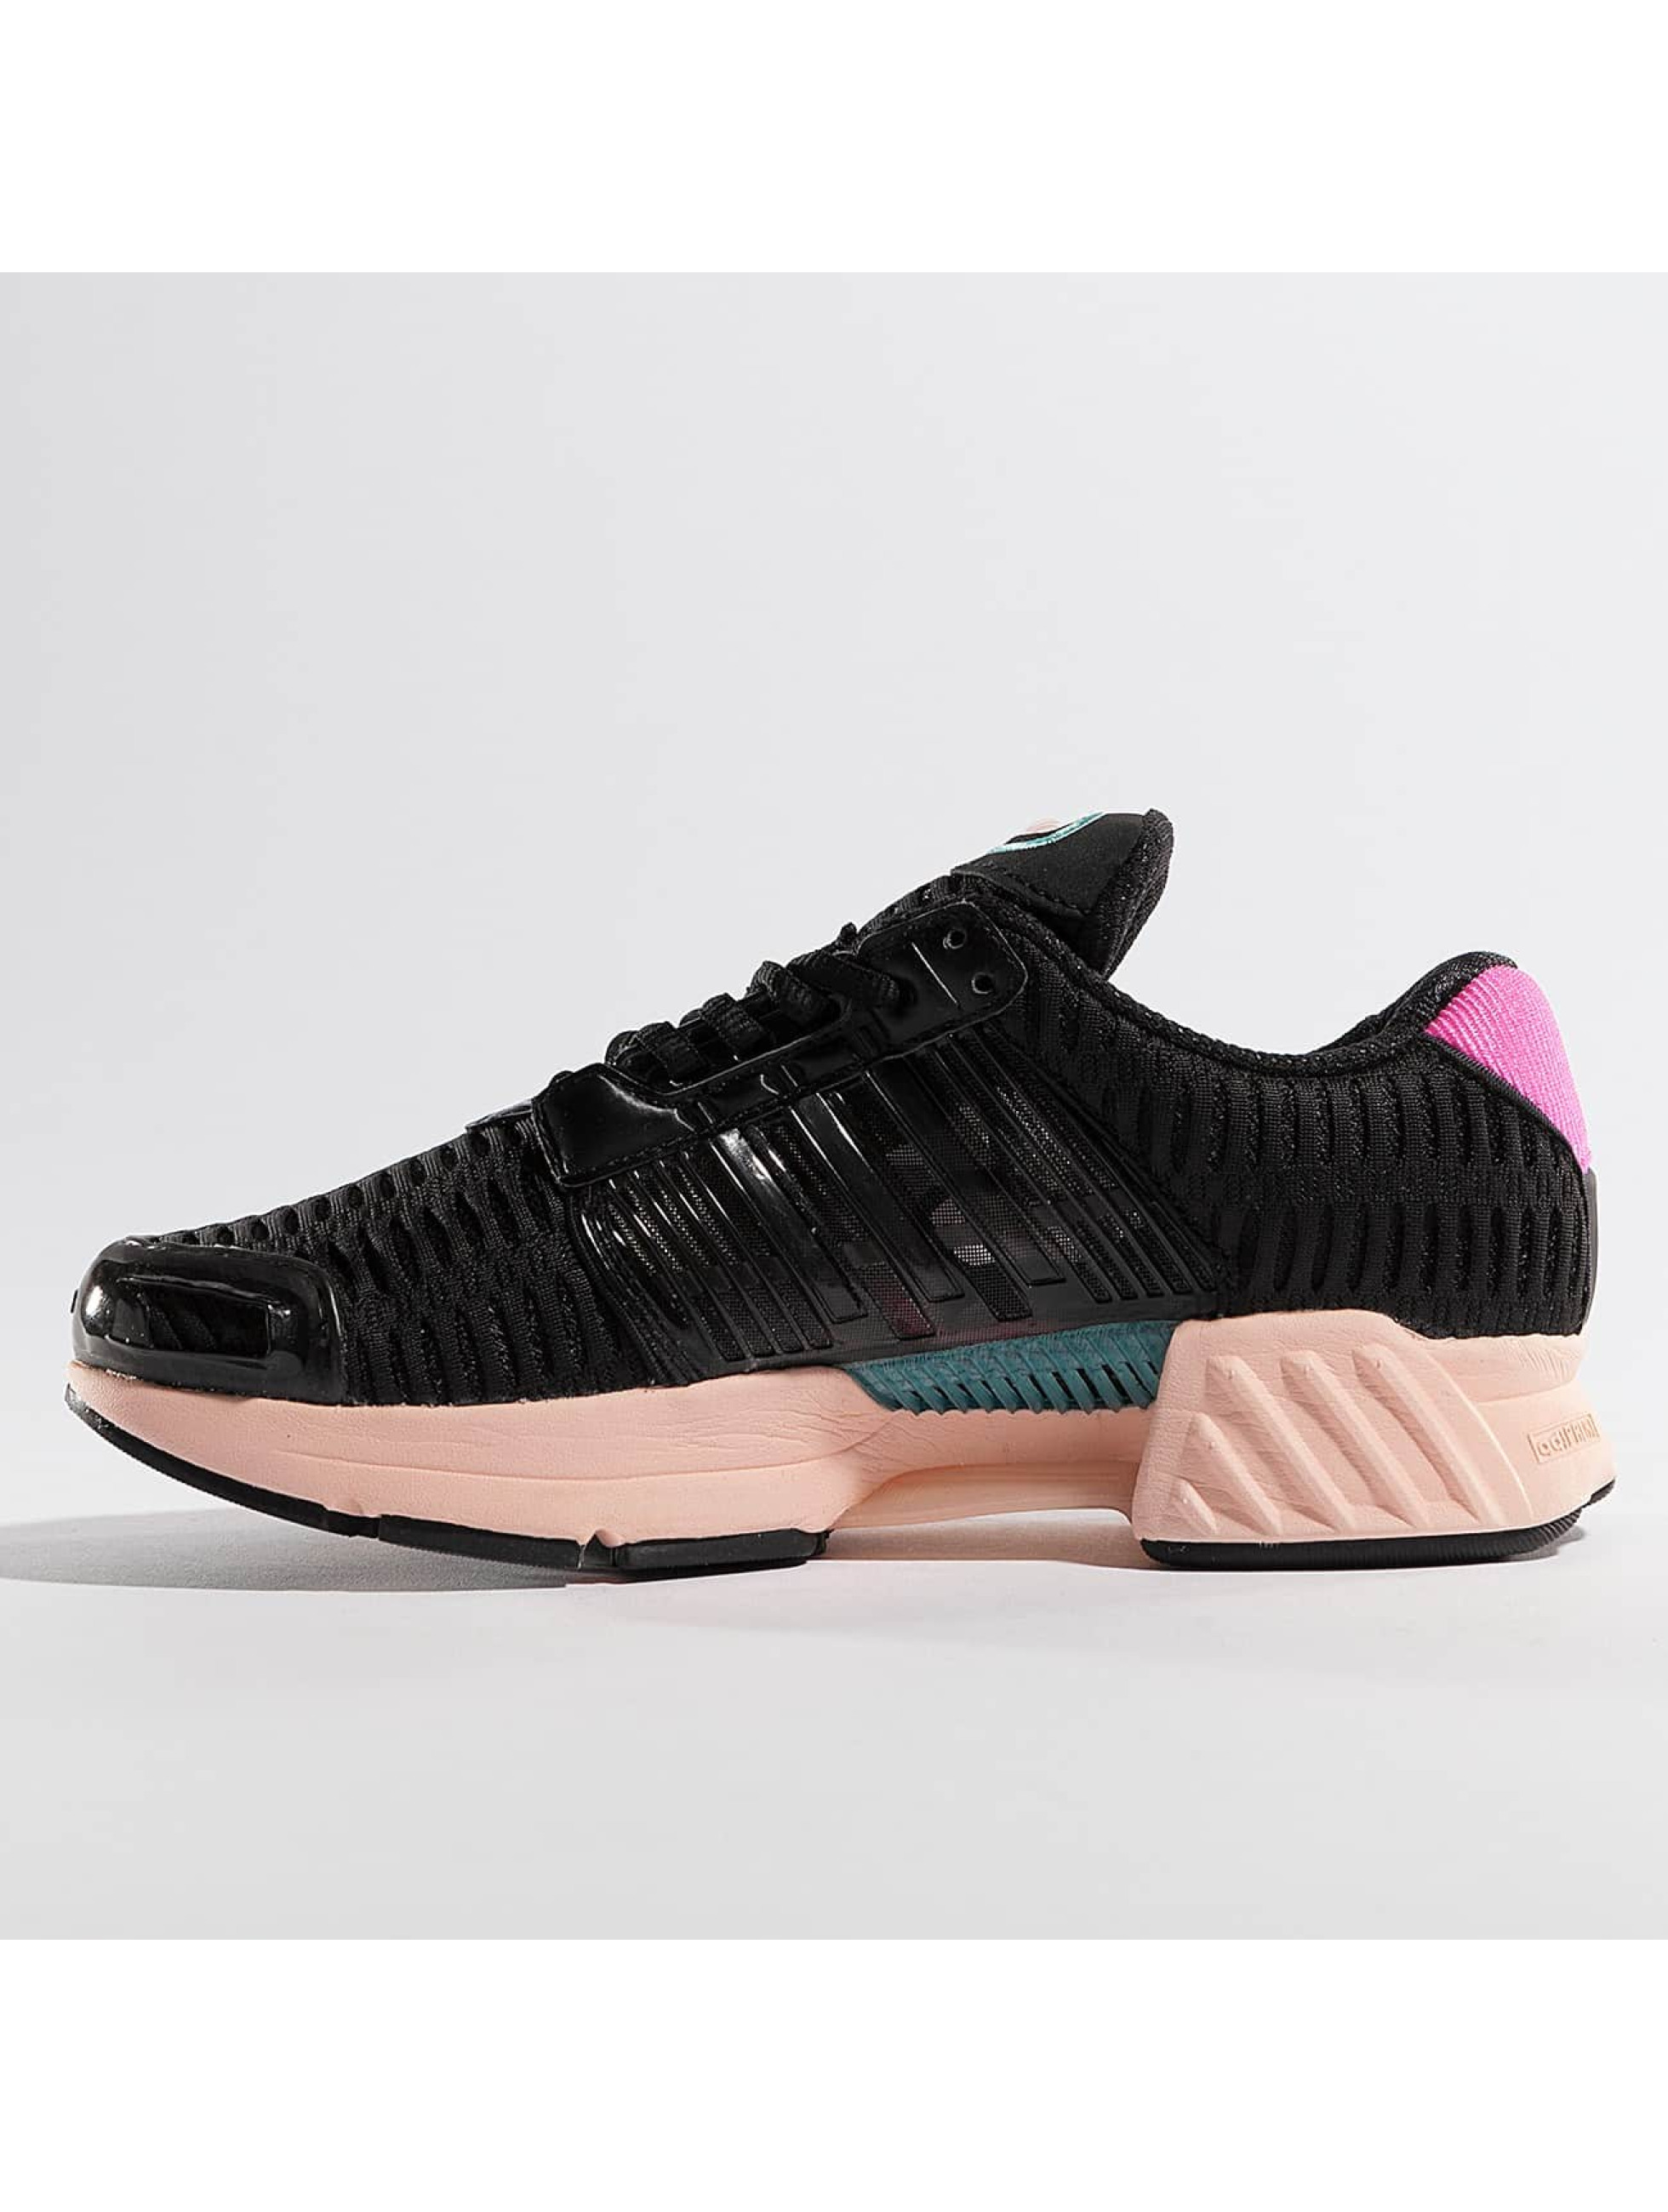 adidas Sneakers Climacool black